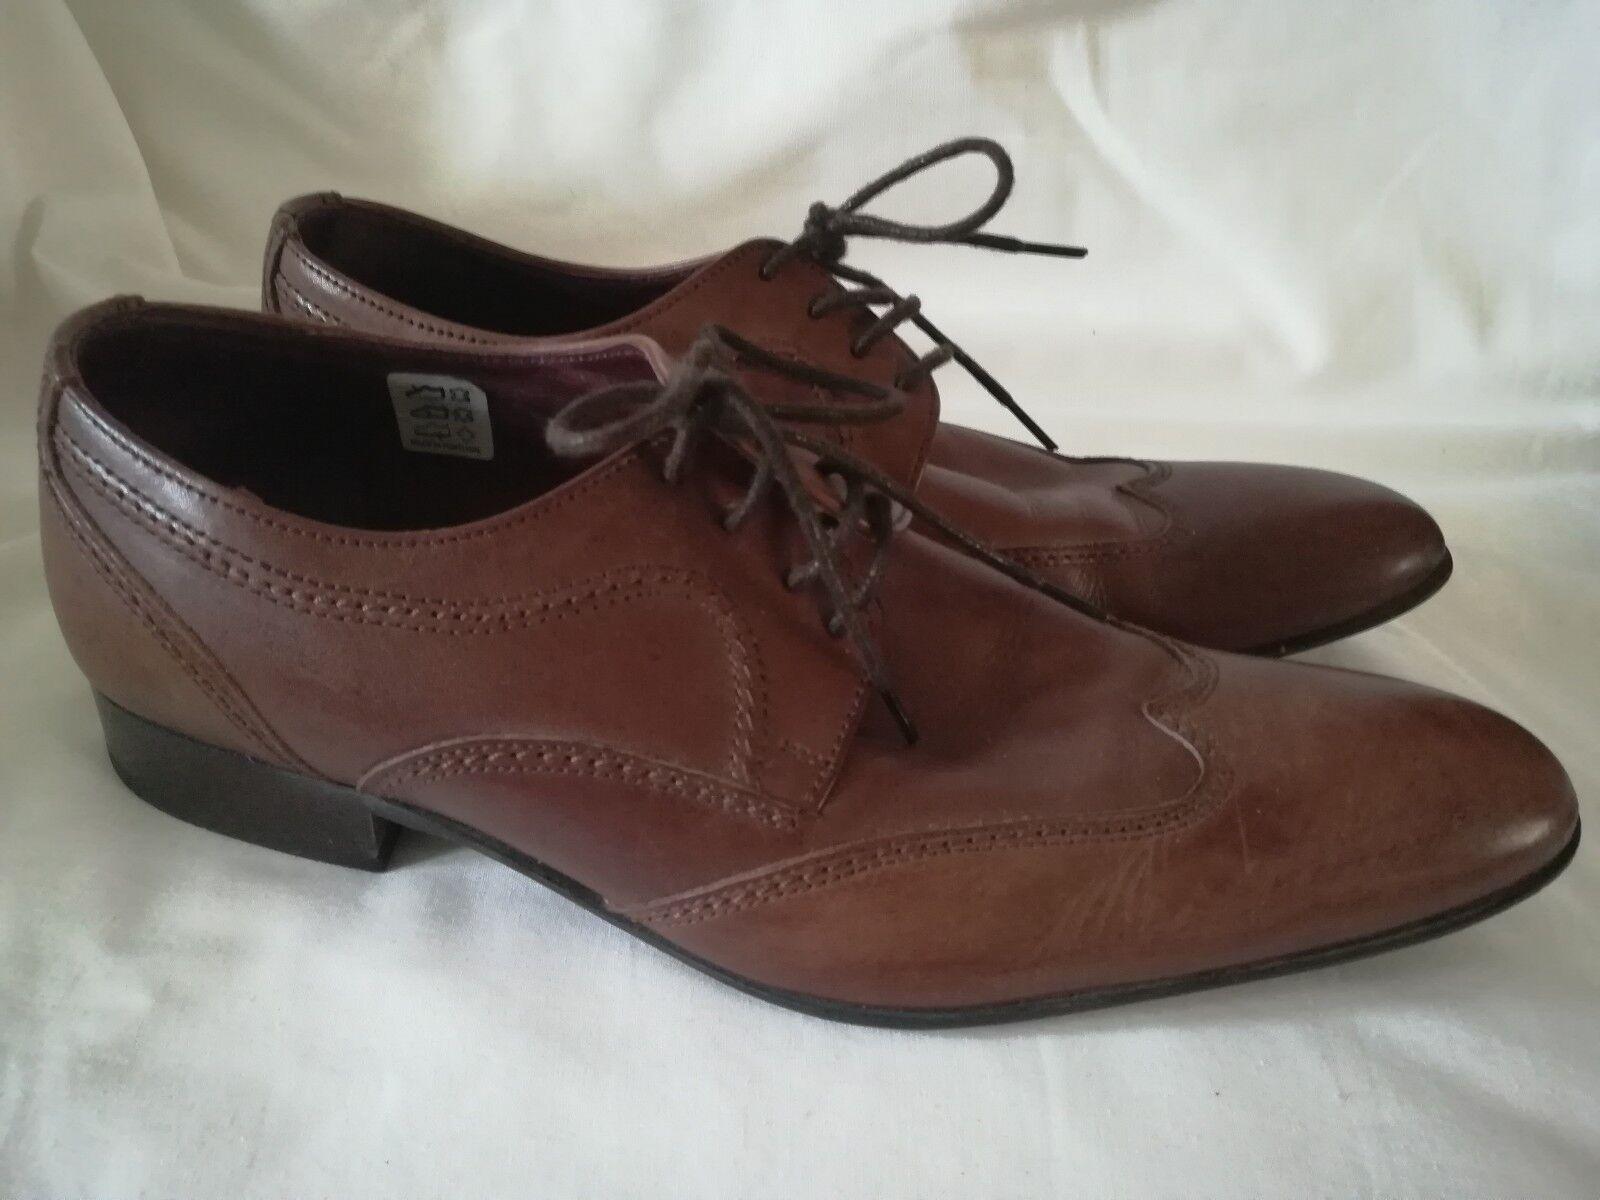 Men's Jones Bootmaker Brown Leather Smart Brogue Oxford shoes Size